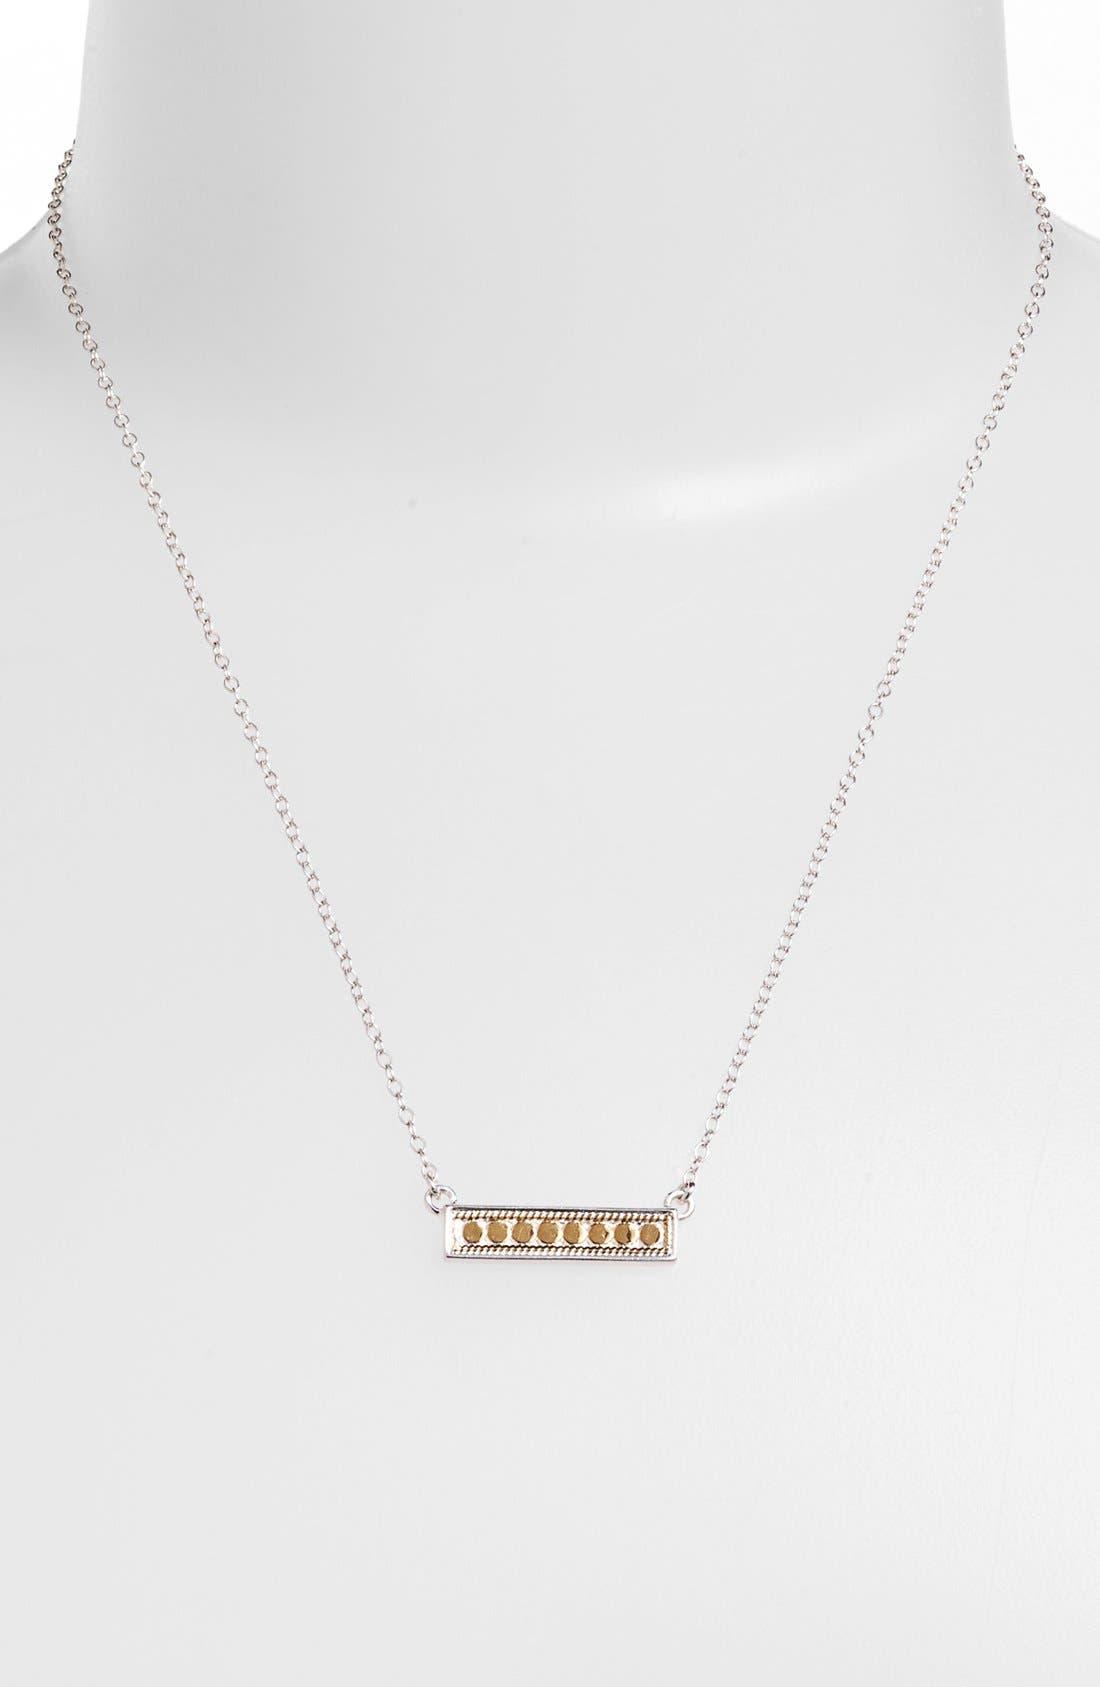 'Gili' Bar Pendant Necklace,                             Alternate thumbnail 6, color,                             GOLD/ SILVER